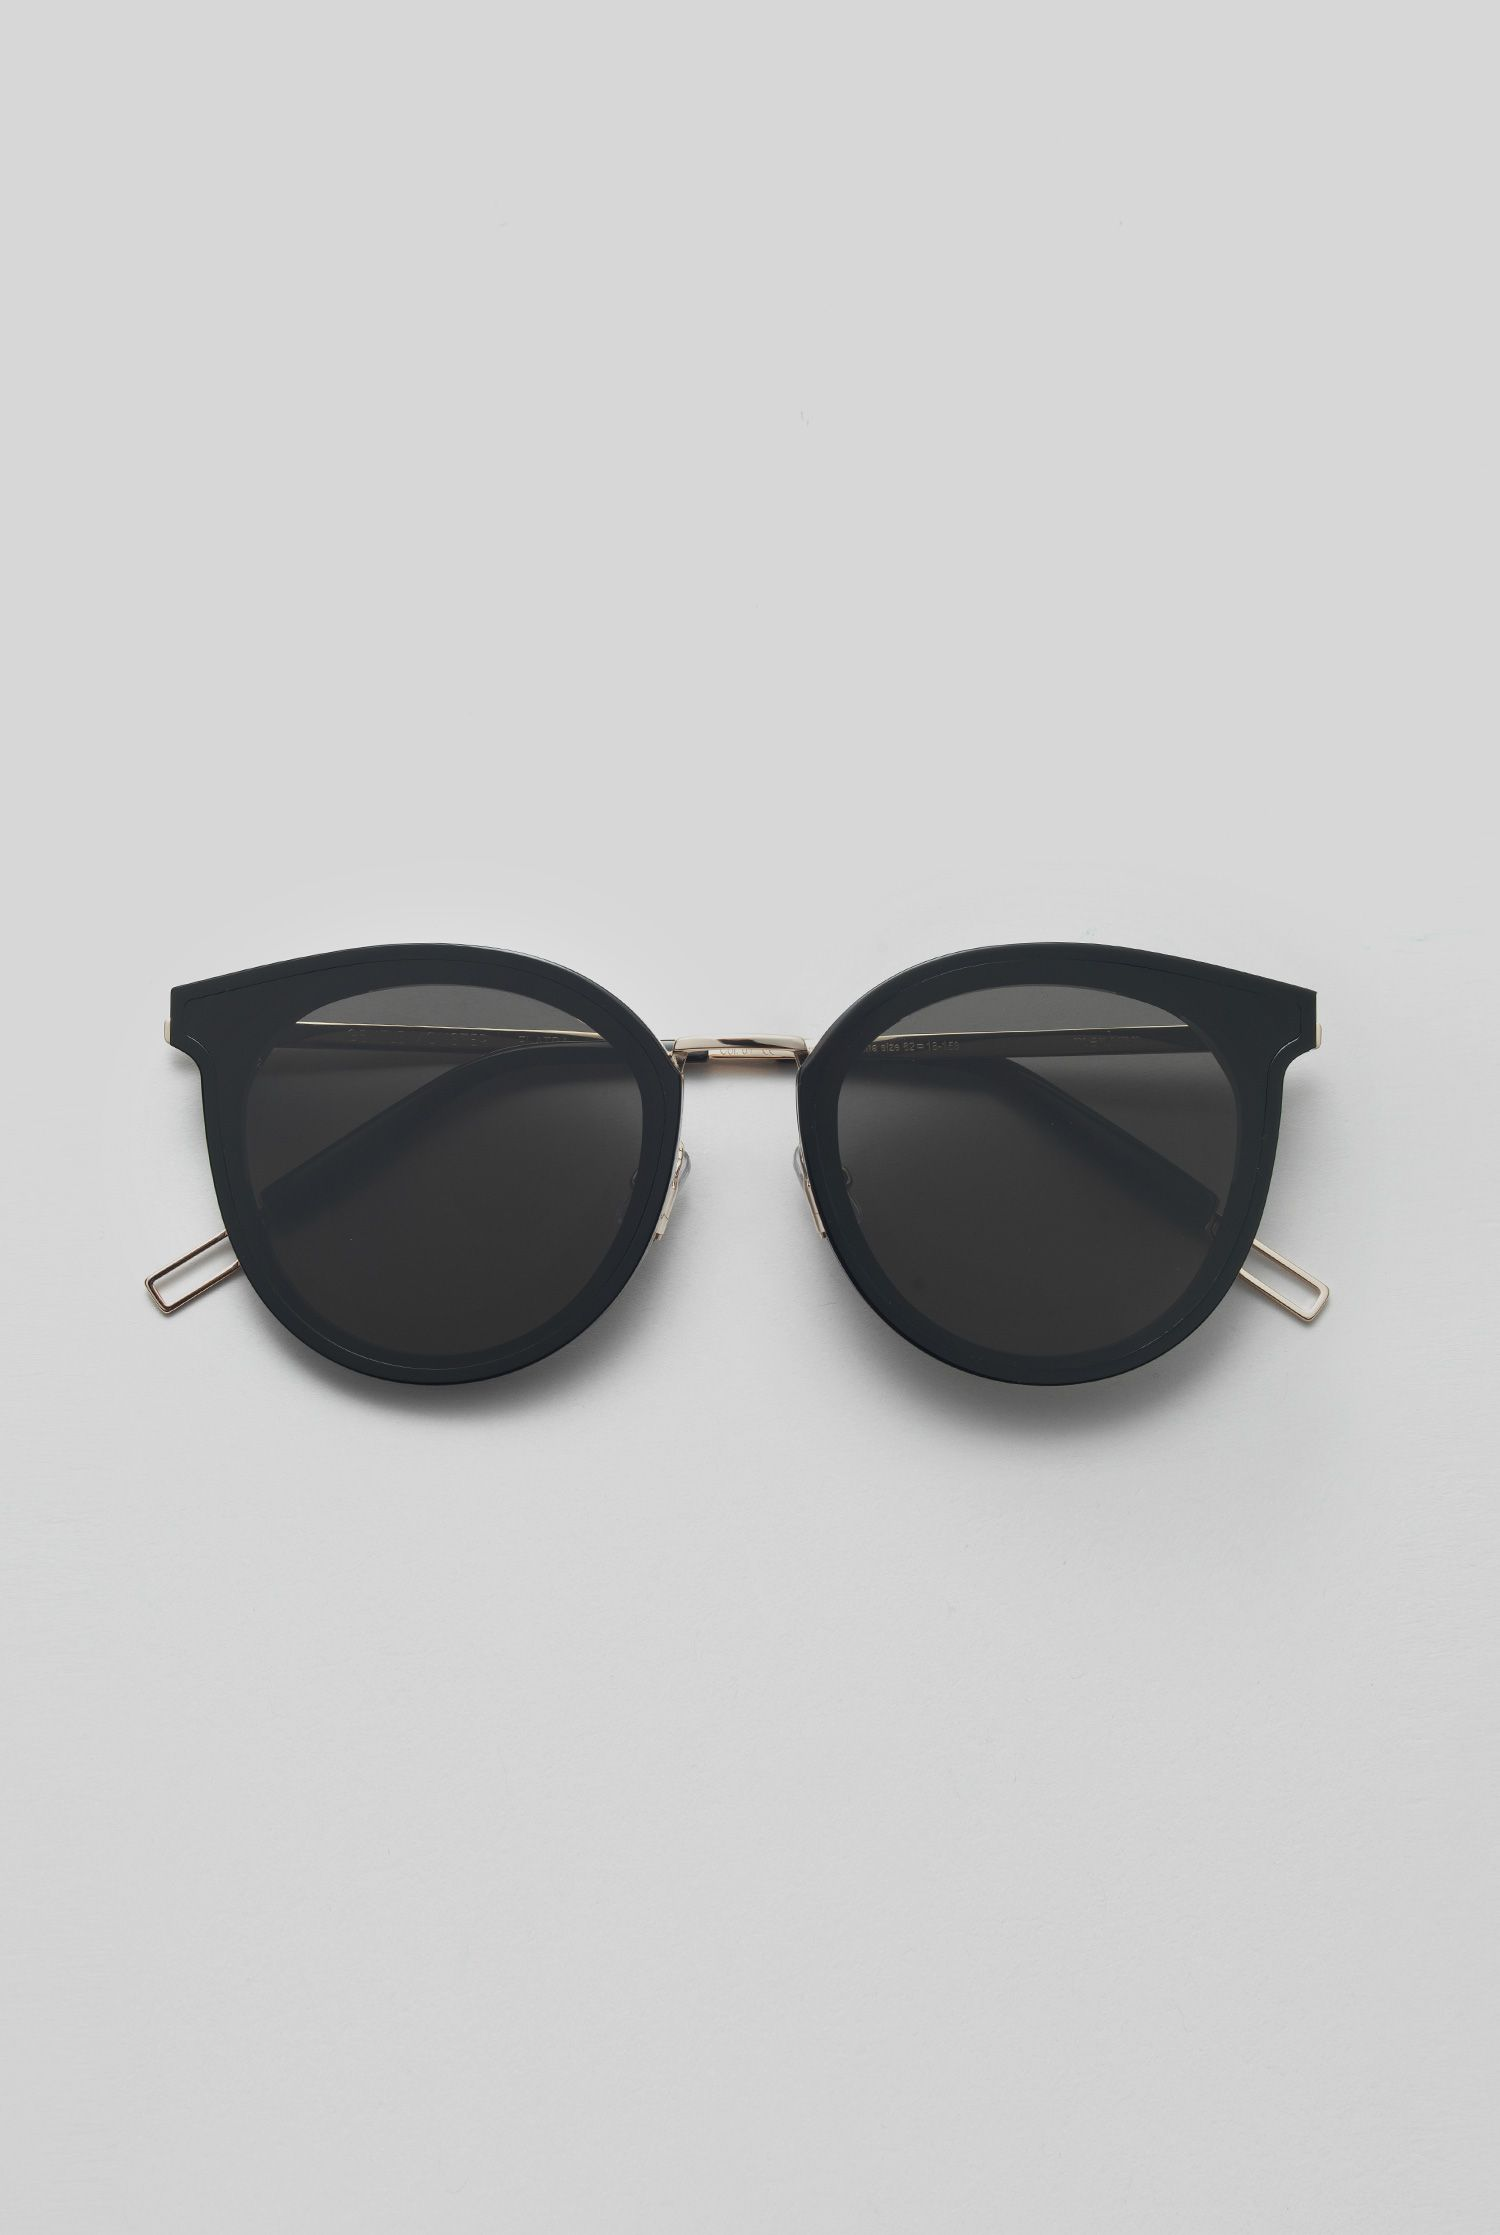 f474825f501eb GENTLE MONSTER 2018 Sunglasses MERLYNN 01 FLATBA